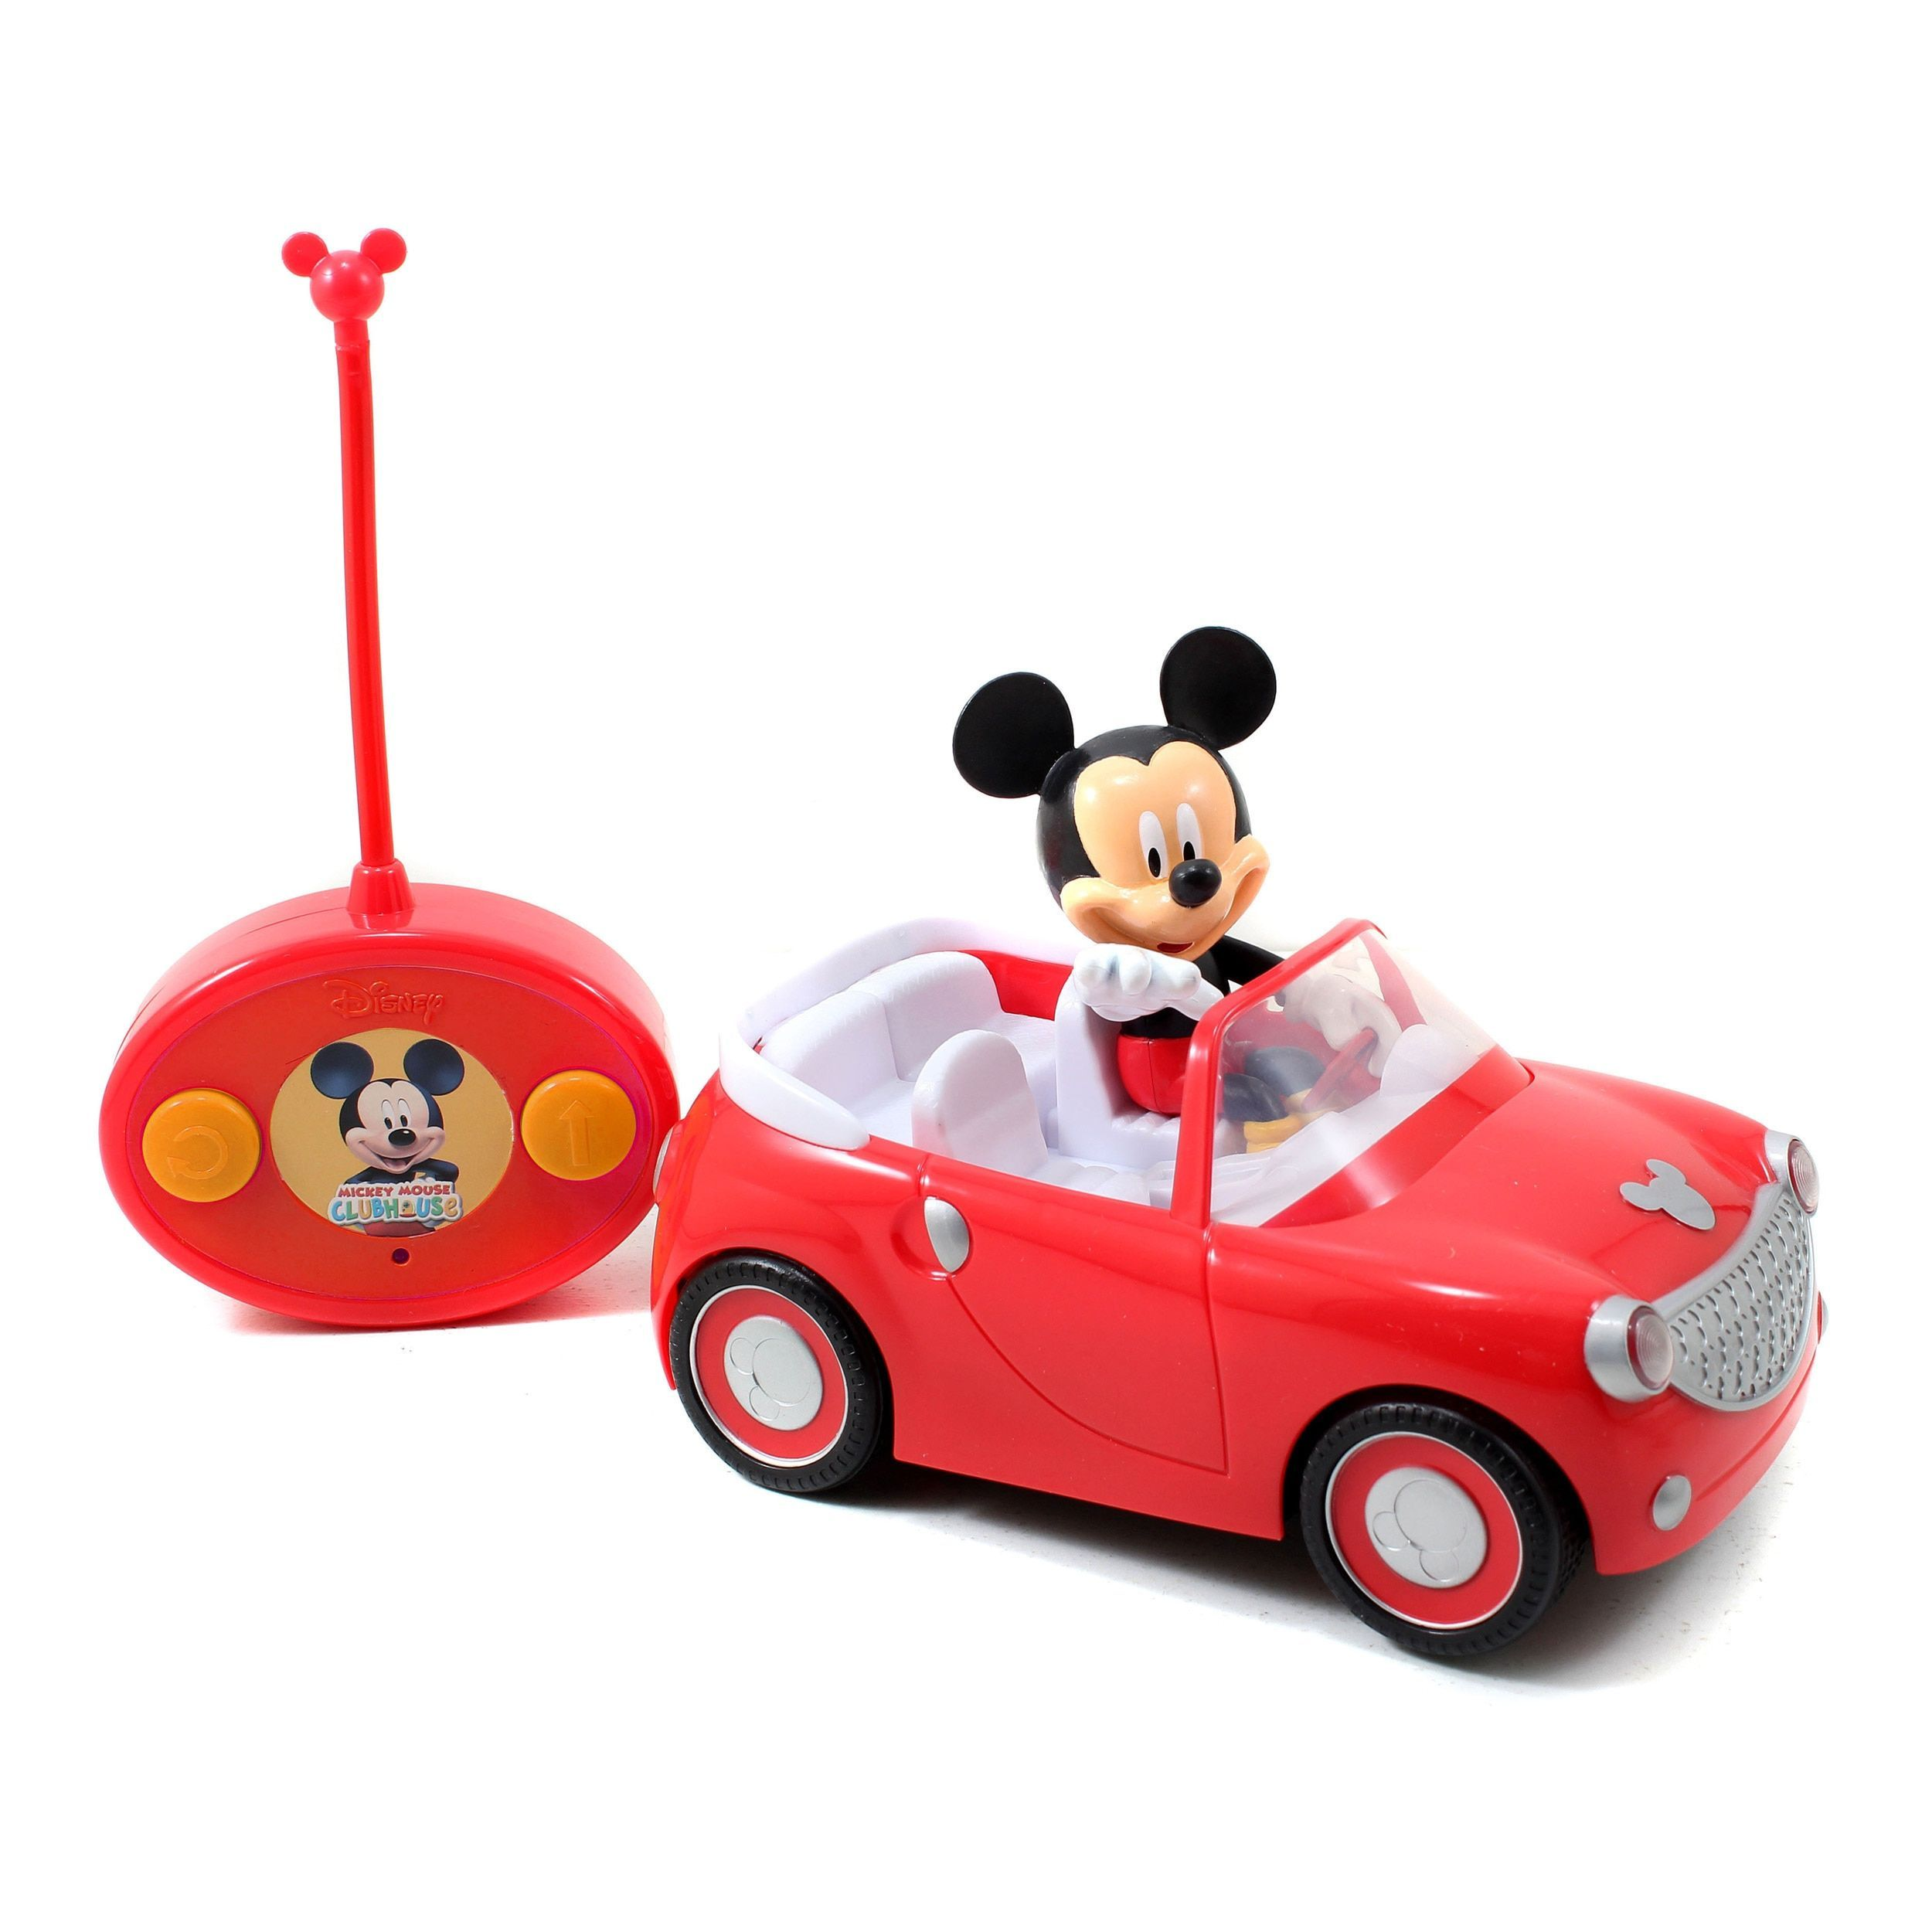 Jada car toys  Jada Toys Disney Mickey Mouse Radio Control Car  Radio Control DIY